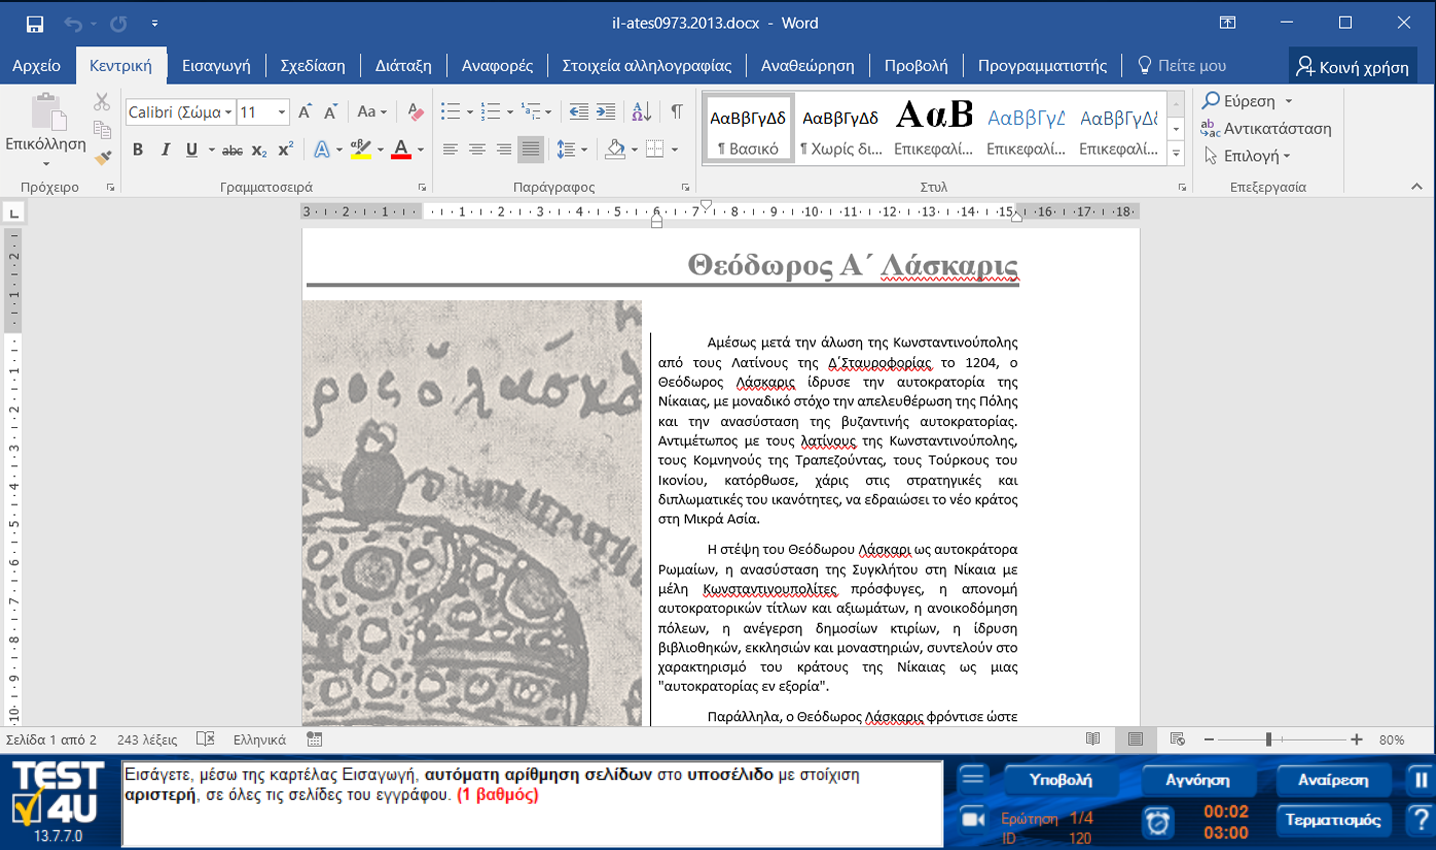 TEST4U Microsoft Word Expert 365, 2019, 2016, 2013, 2010, 2007, 2003 Greek version